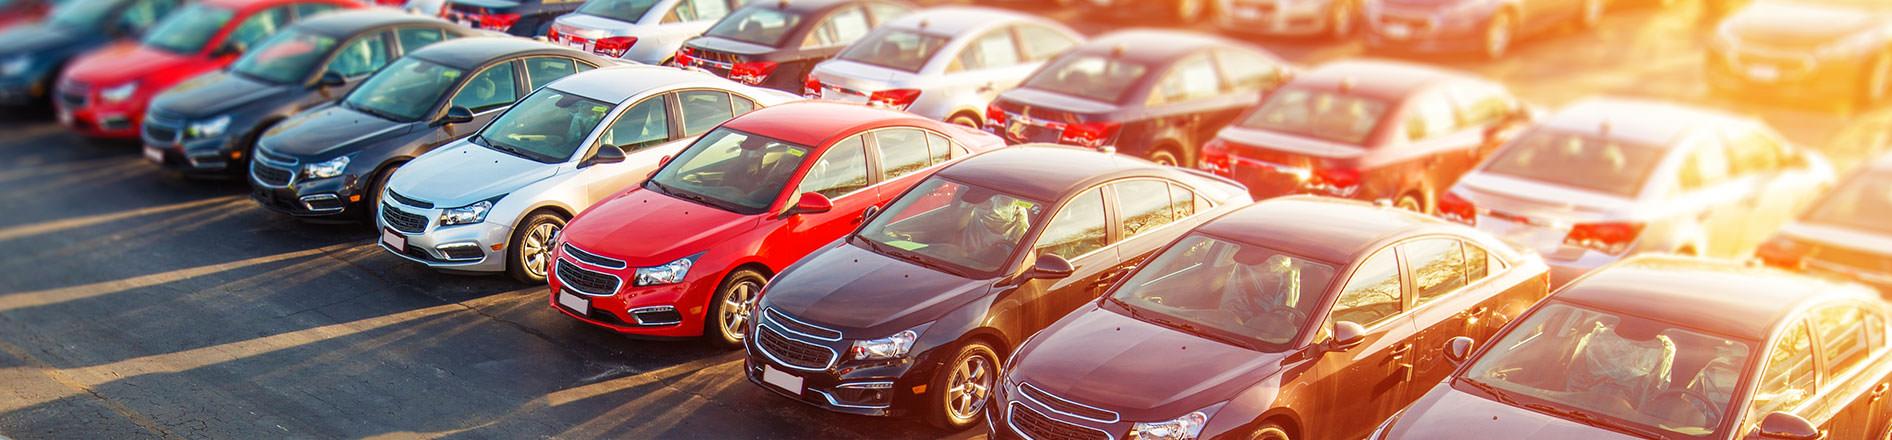 auto dealerships dopkins co llp auto dealerships